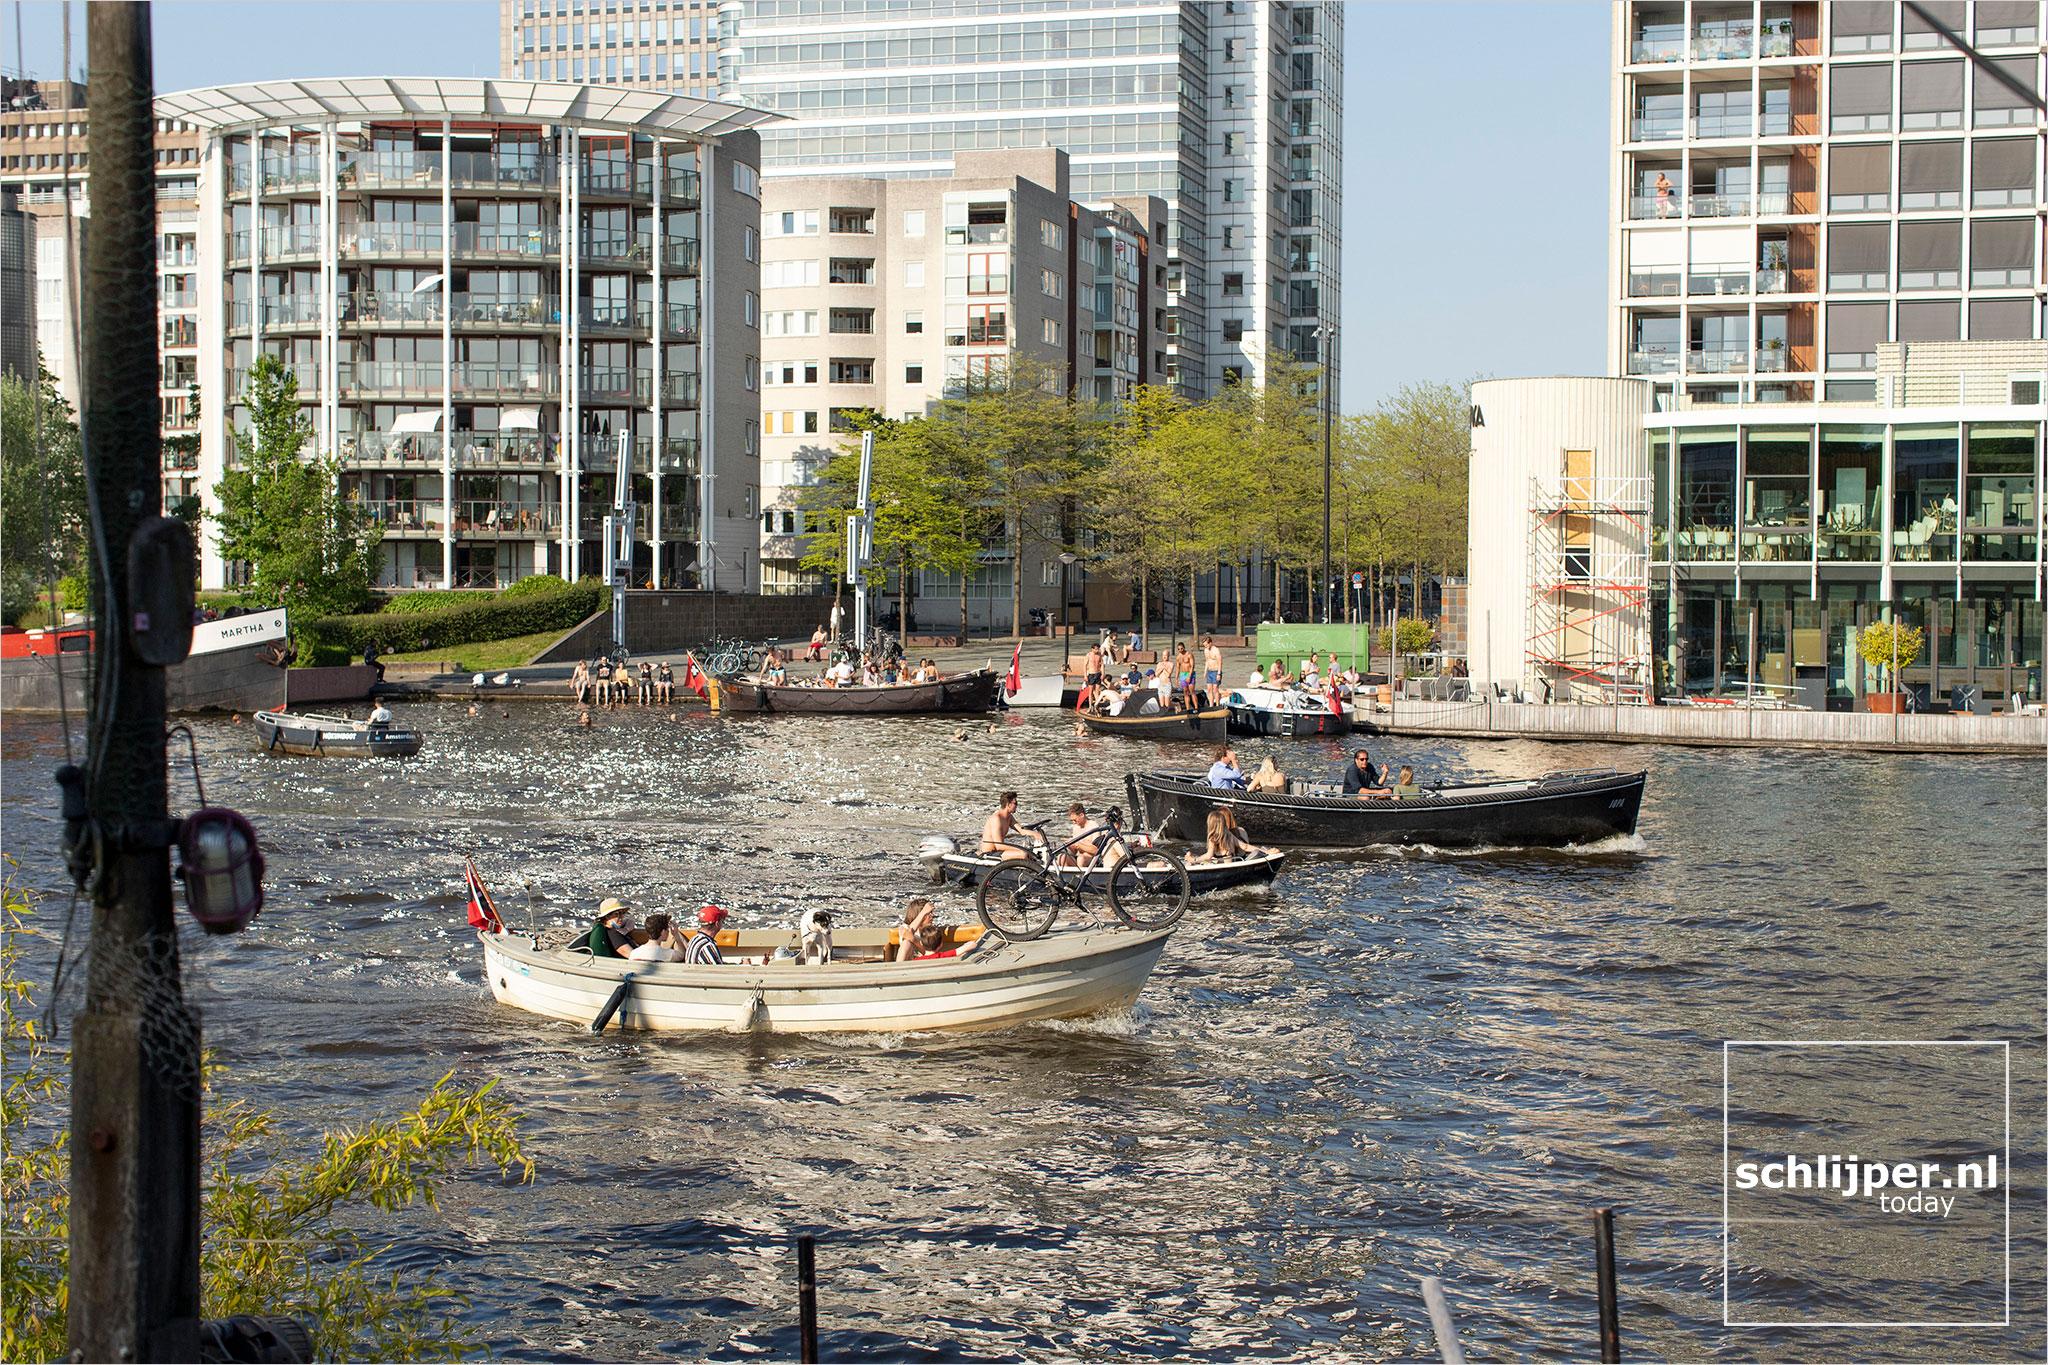 The Netherlands, Amsterdam 2 juni 2021